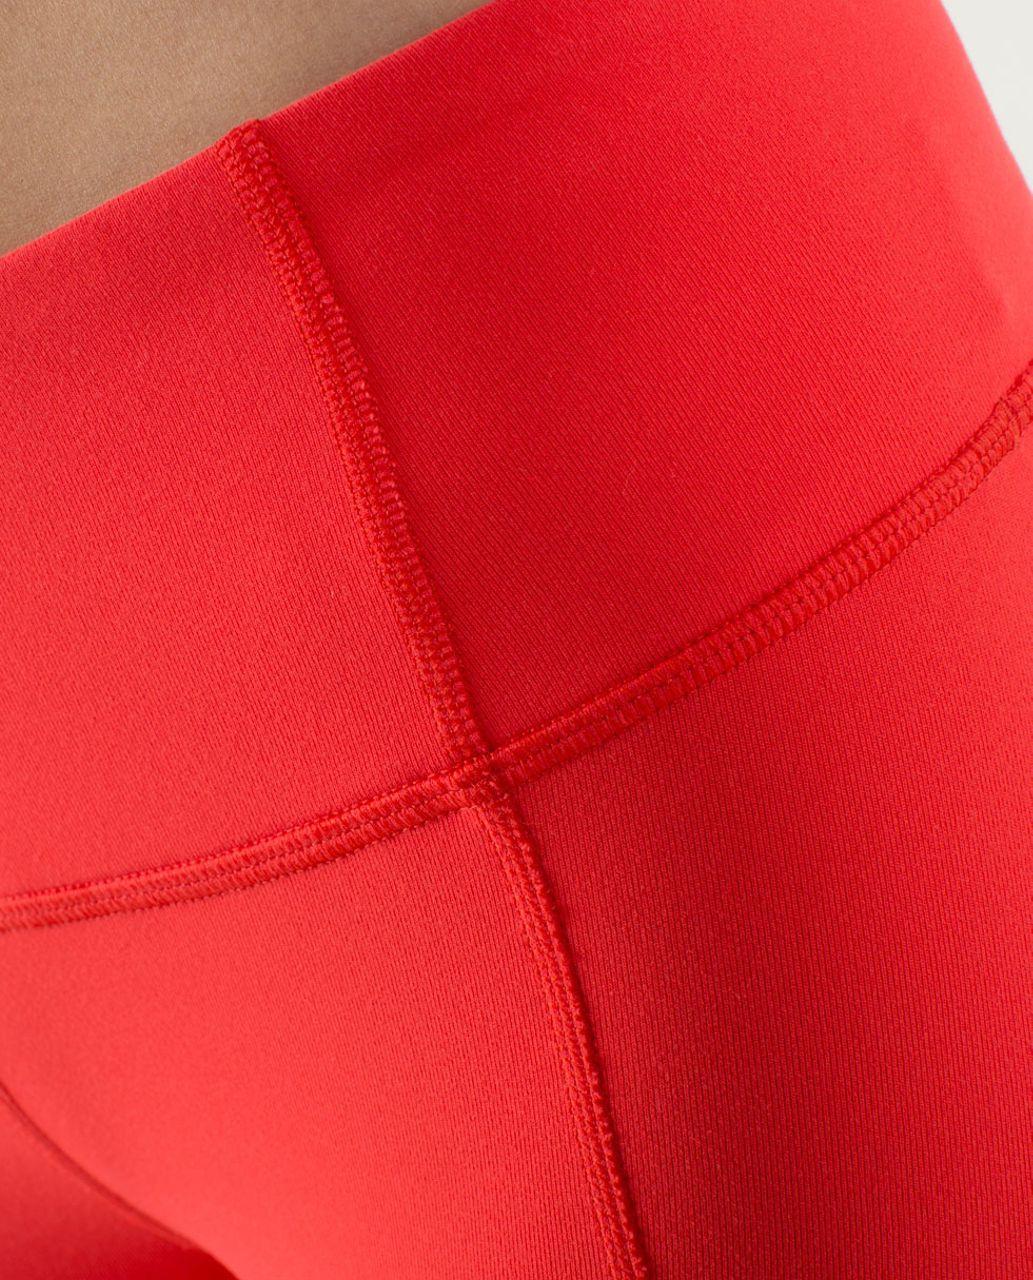 Lululemon Gather & Crow Crop - Love Red / Twin Stripe Love Red